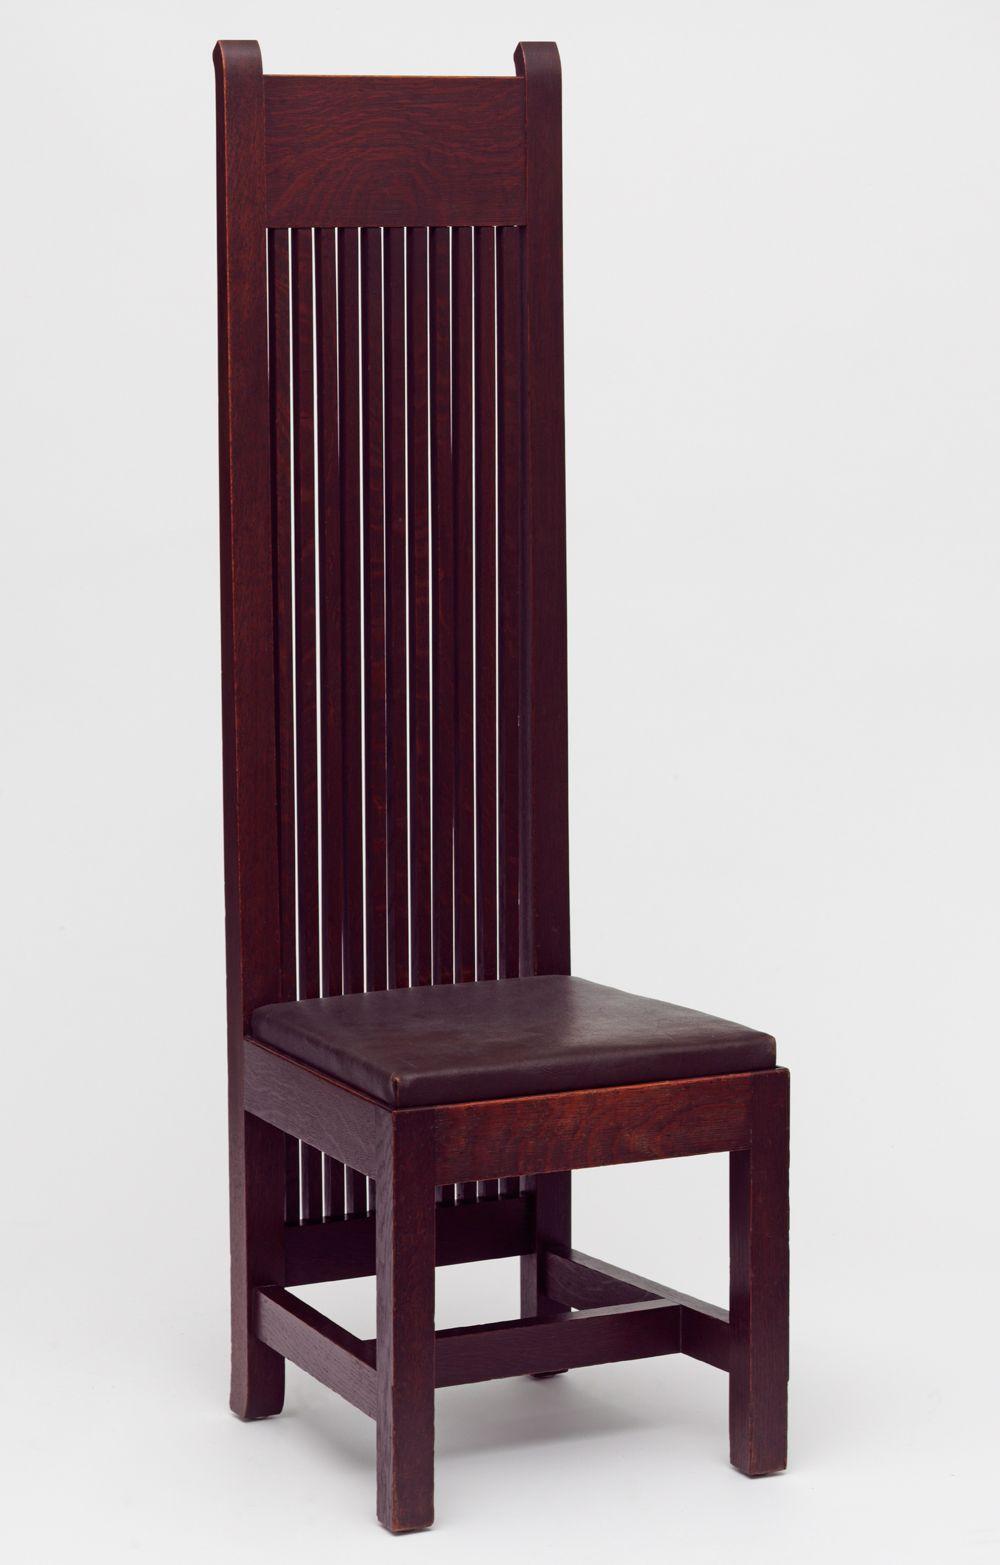 Dining Chair Frank Lloyd Wright 1902 Furniture Design Chair